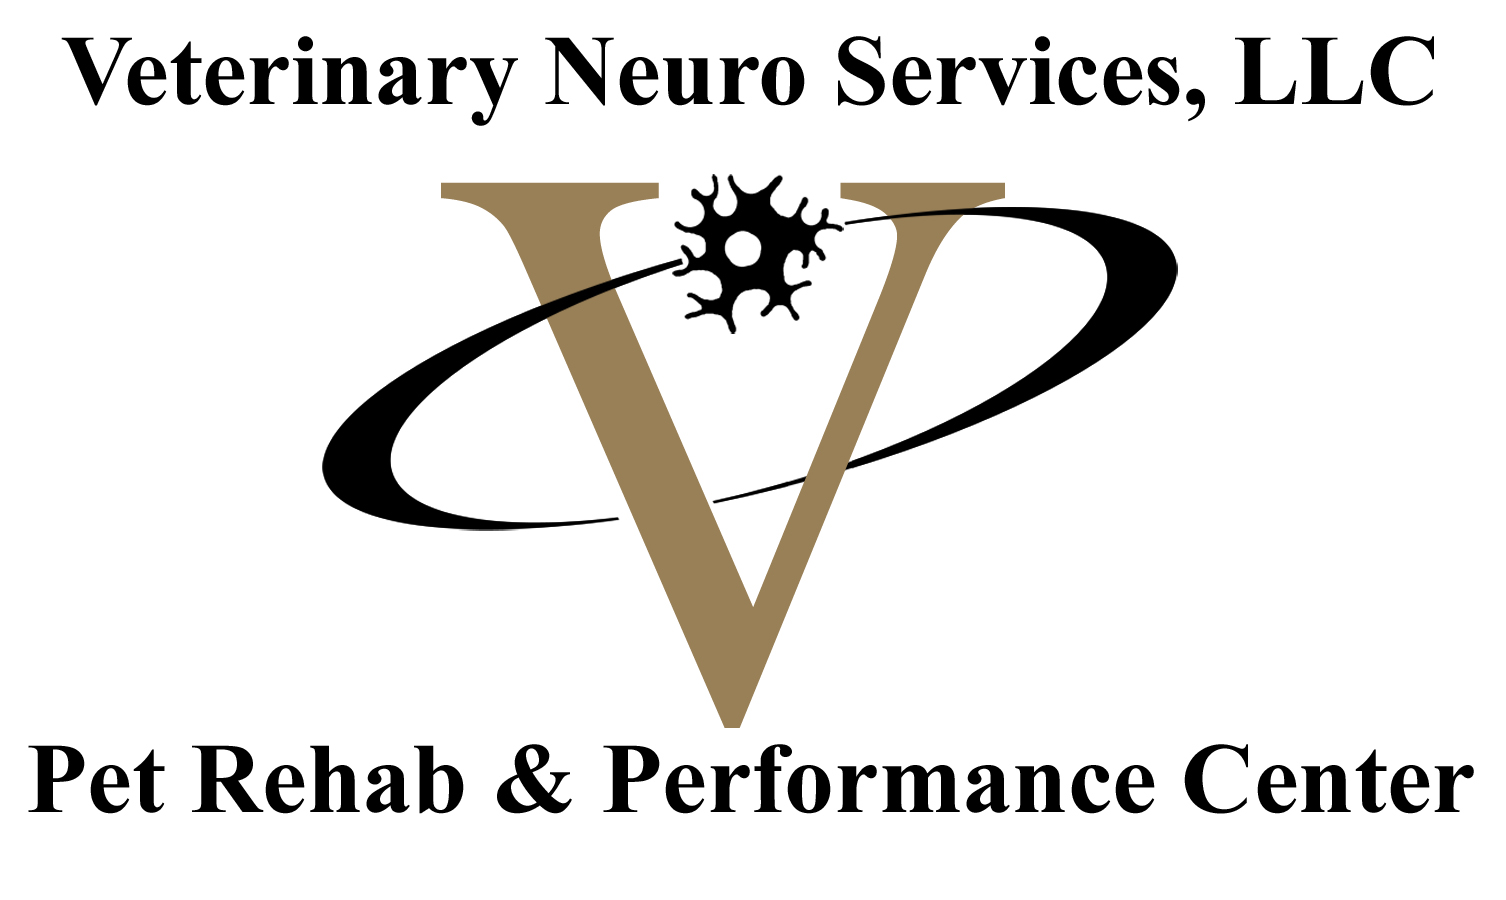 Veterinary Neuro Services, LLC